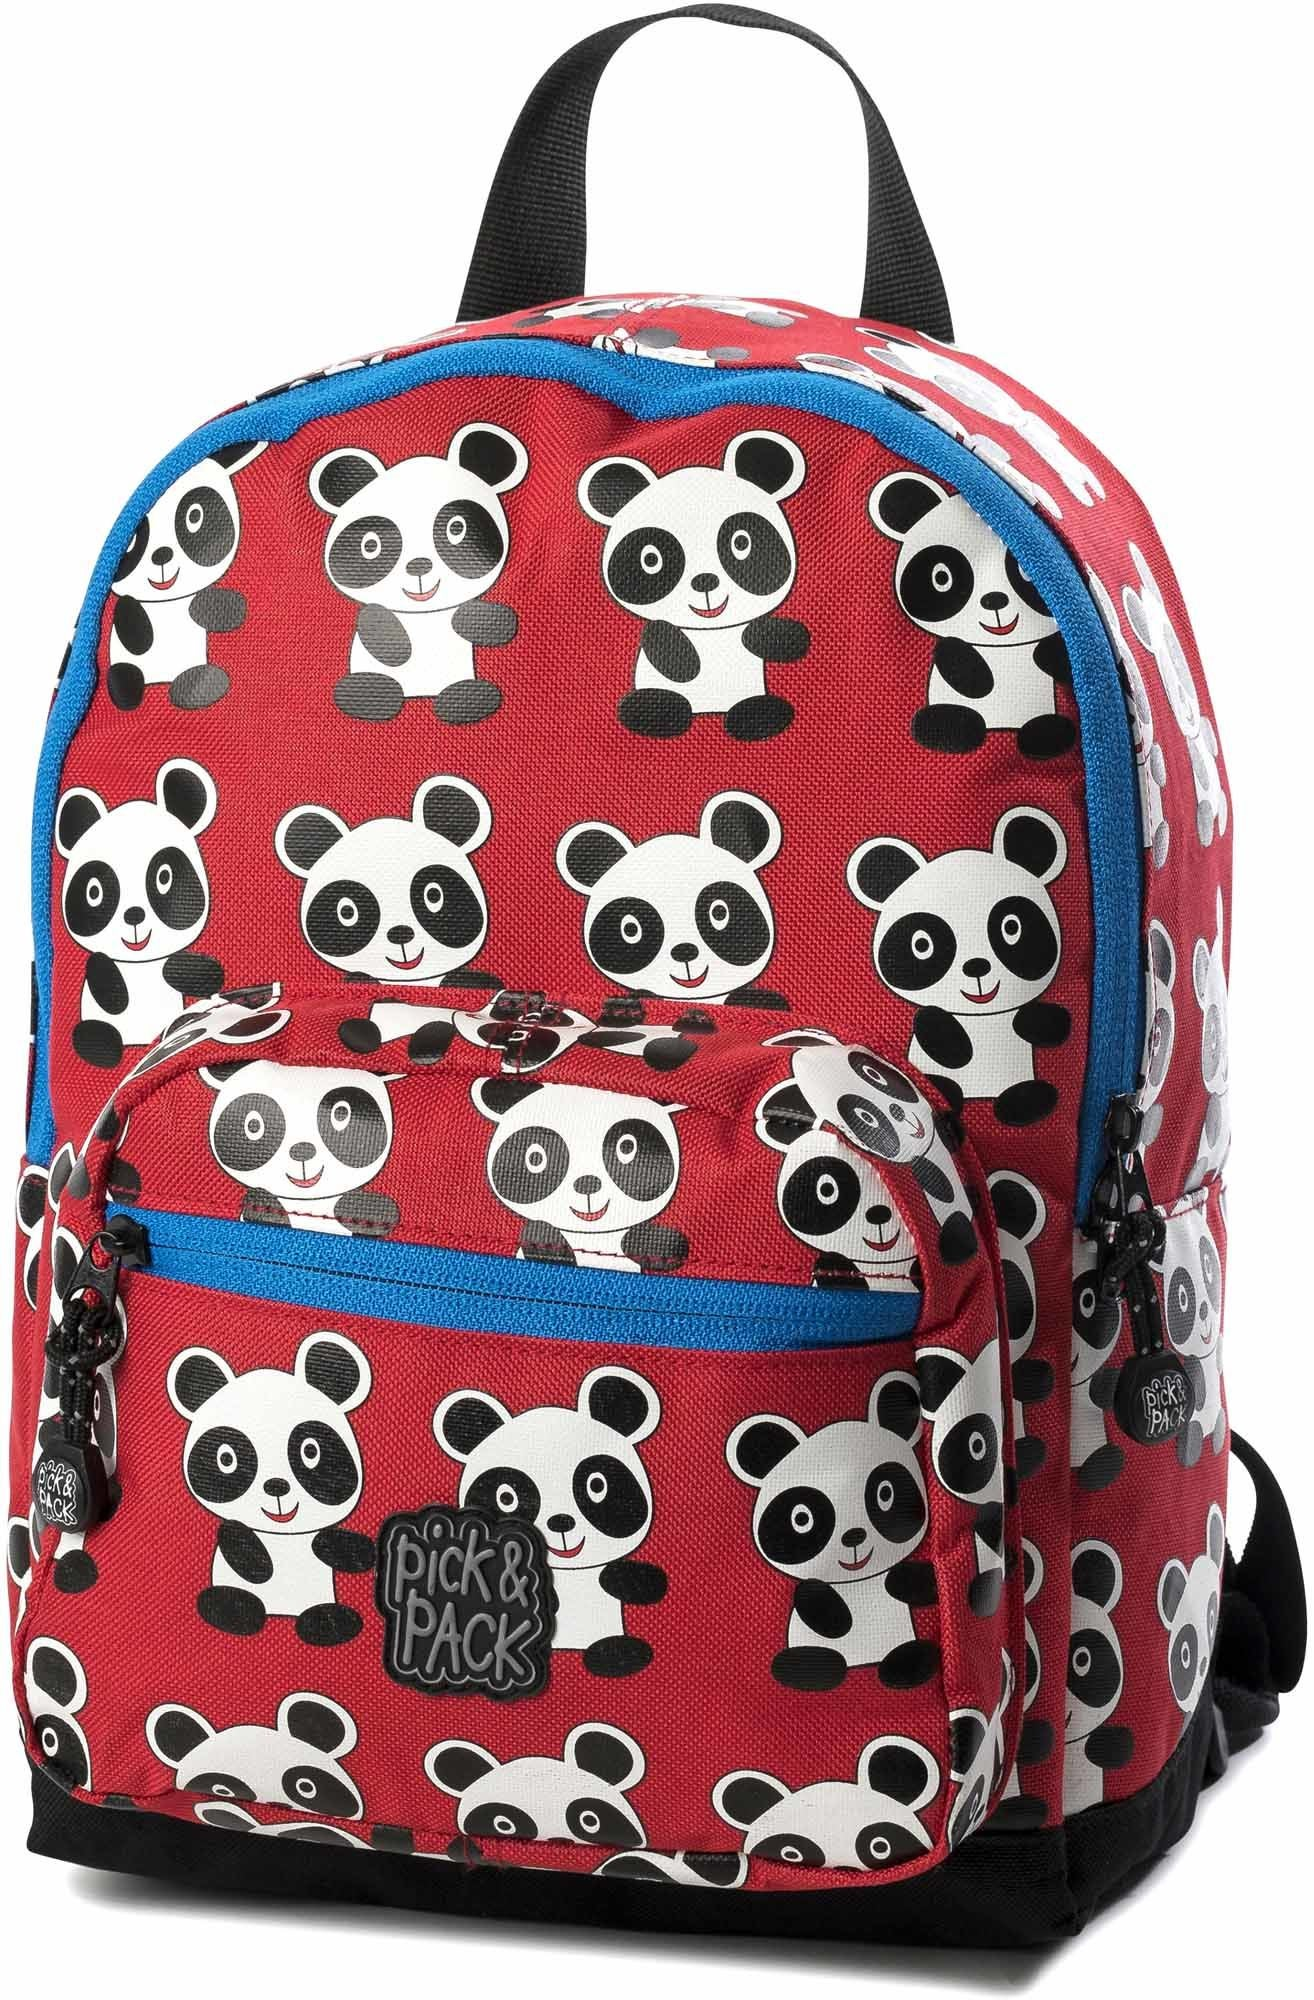 Pick & Pack Ryggsäck Panda, Red